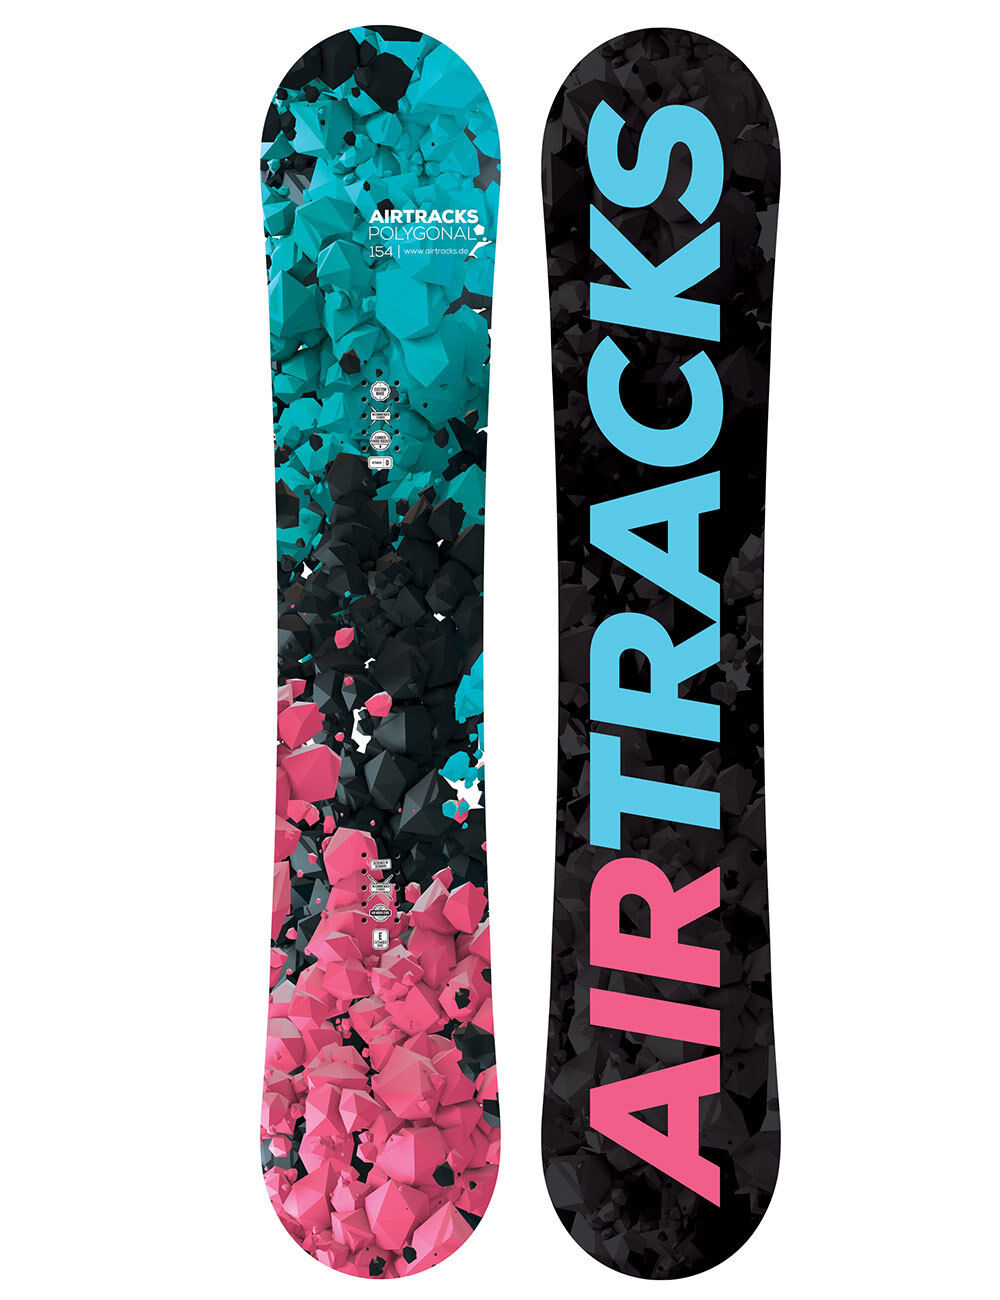 Airtracks Snowboard Mujer Polygonal Freestyle Todo Montaña 138 144 148 154cm